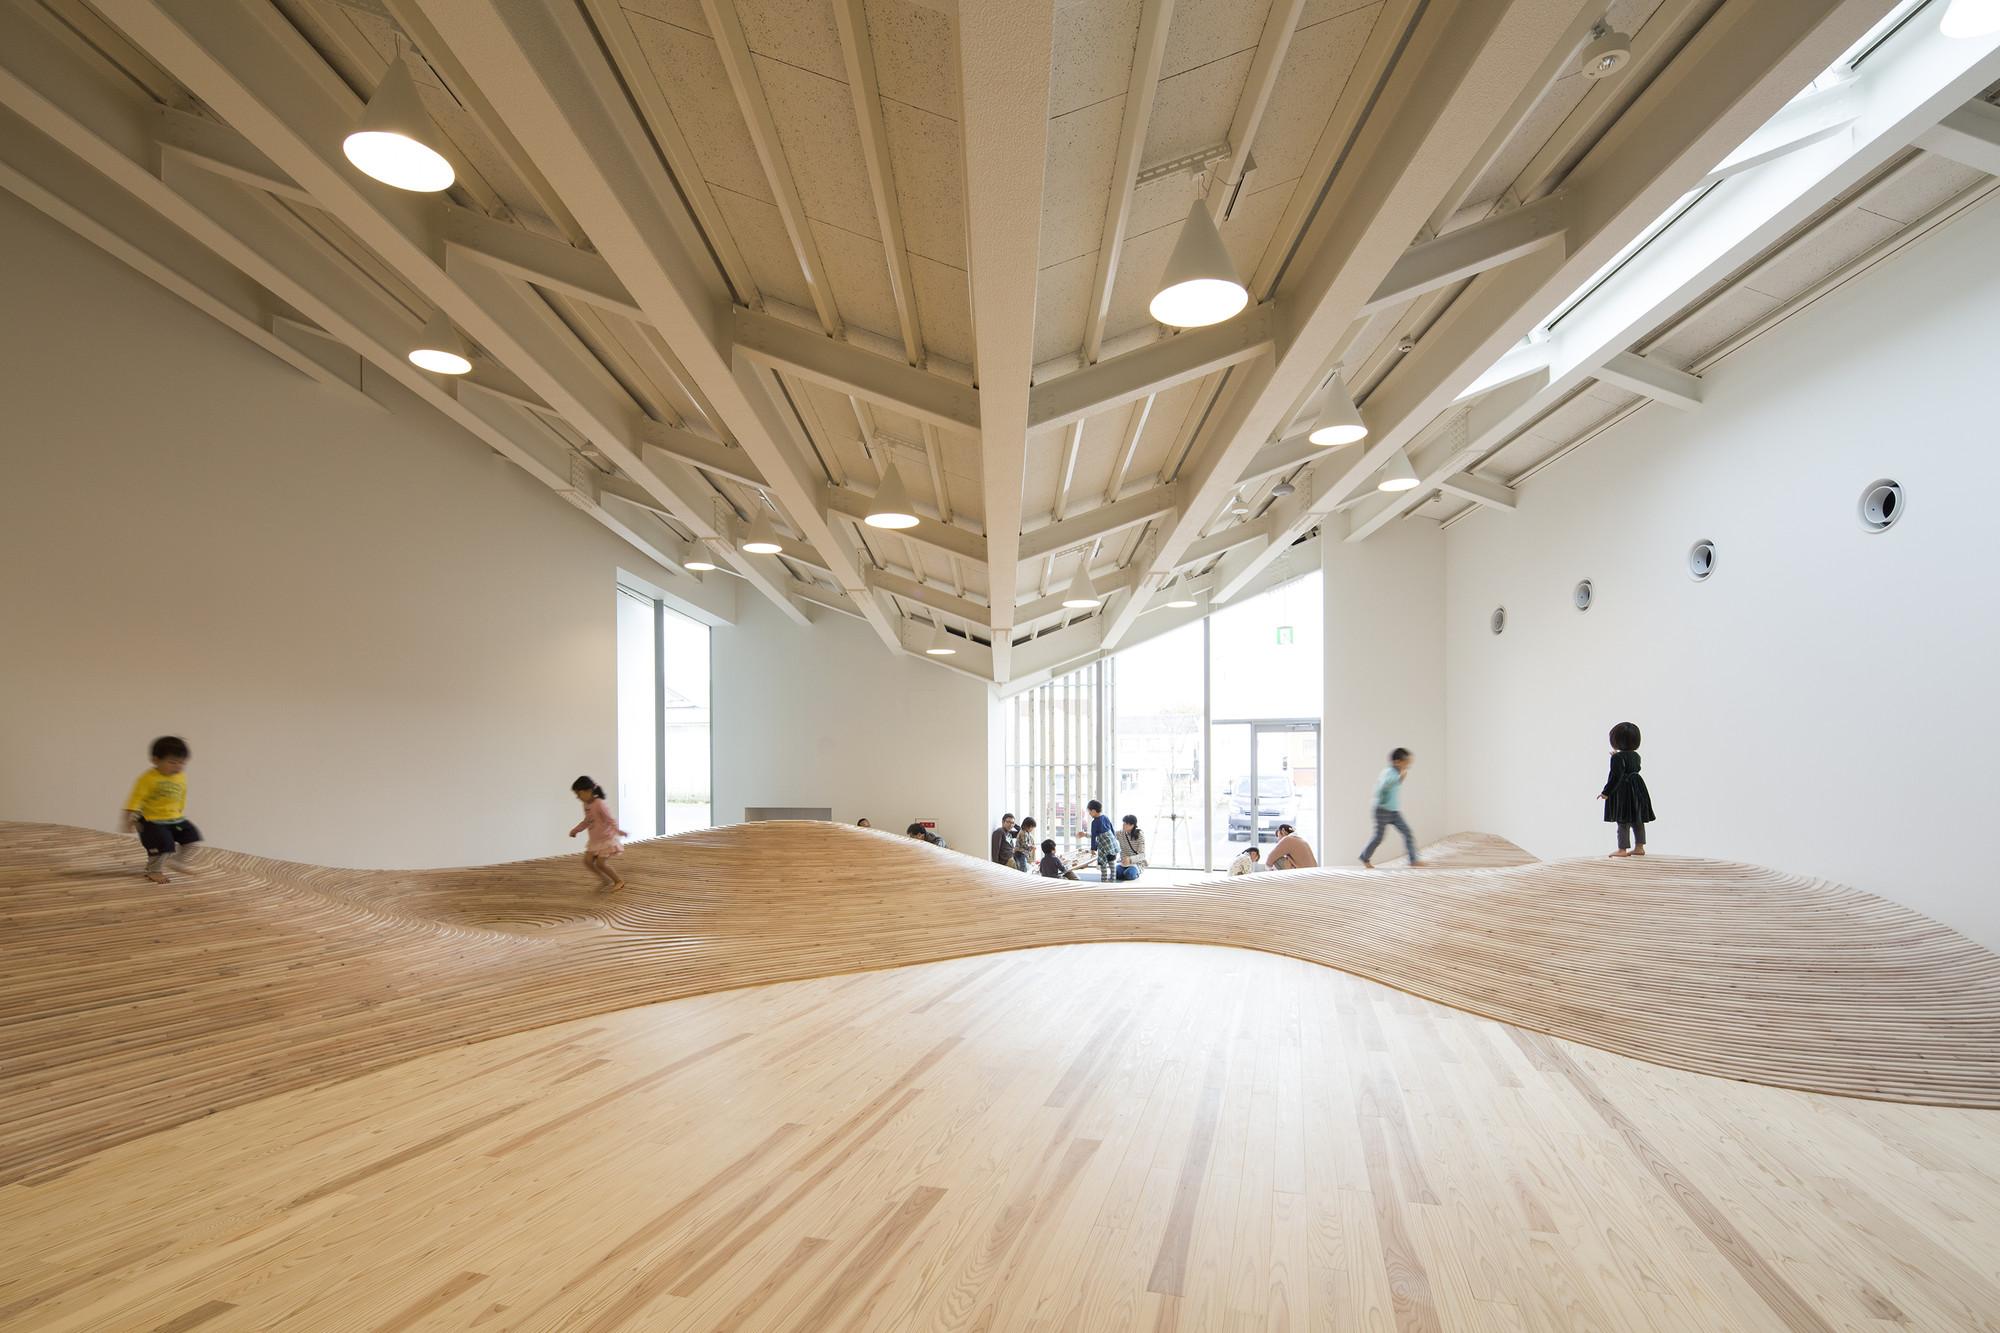 Plaza Comunitaria Towada / Kengo Kuma & Associates, © Kenta Hasegawa